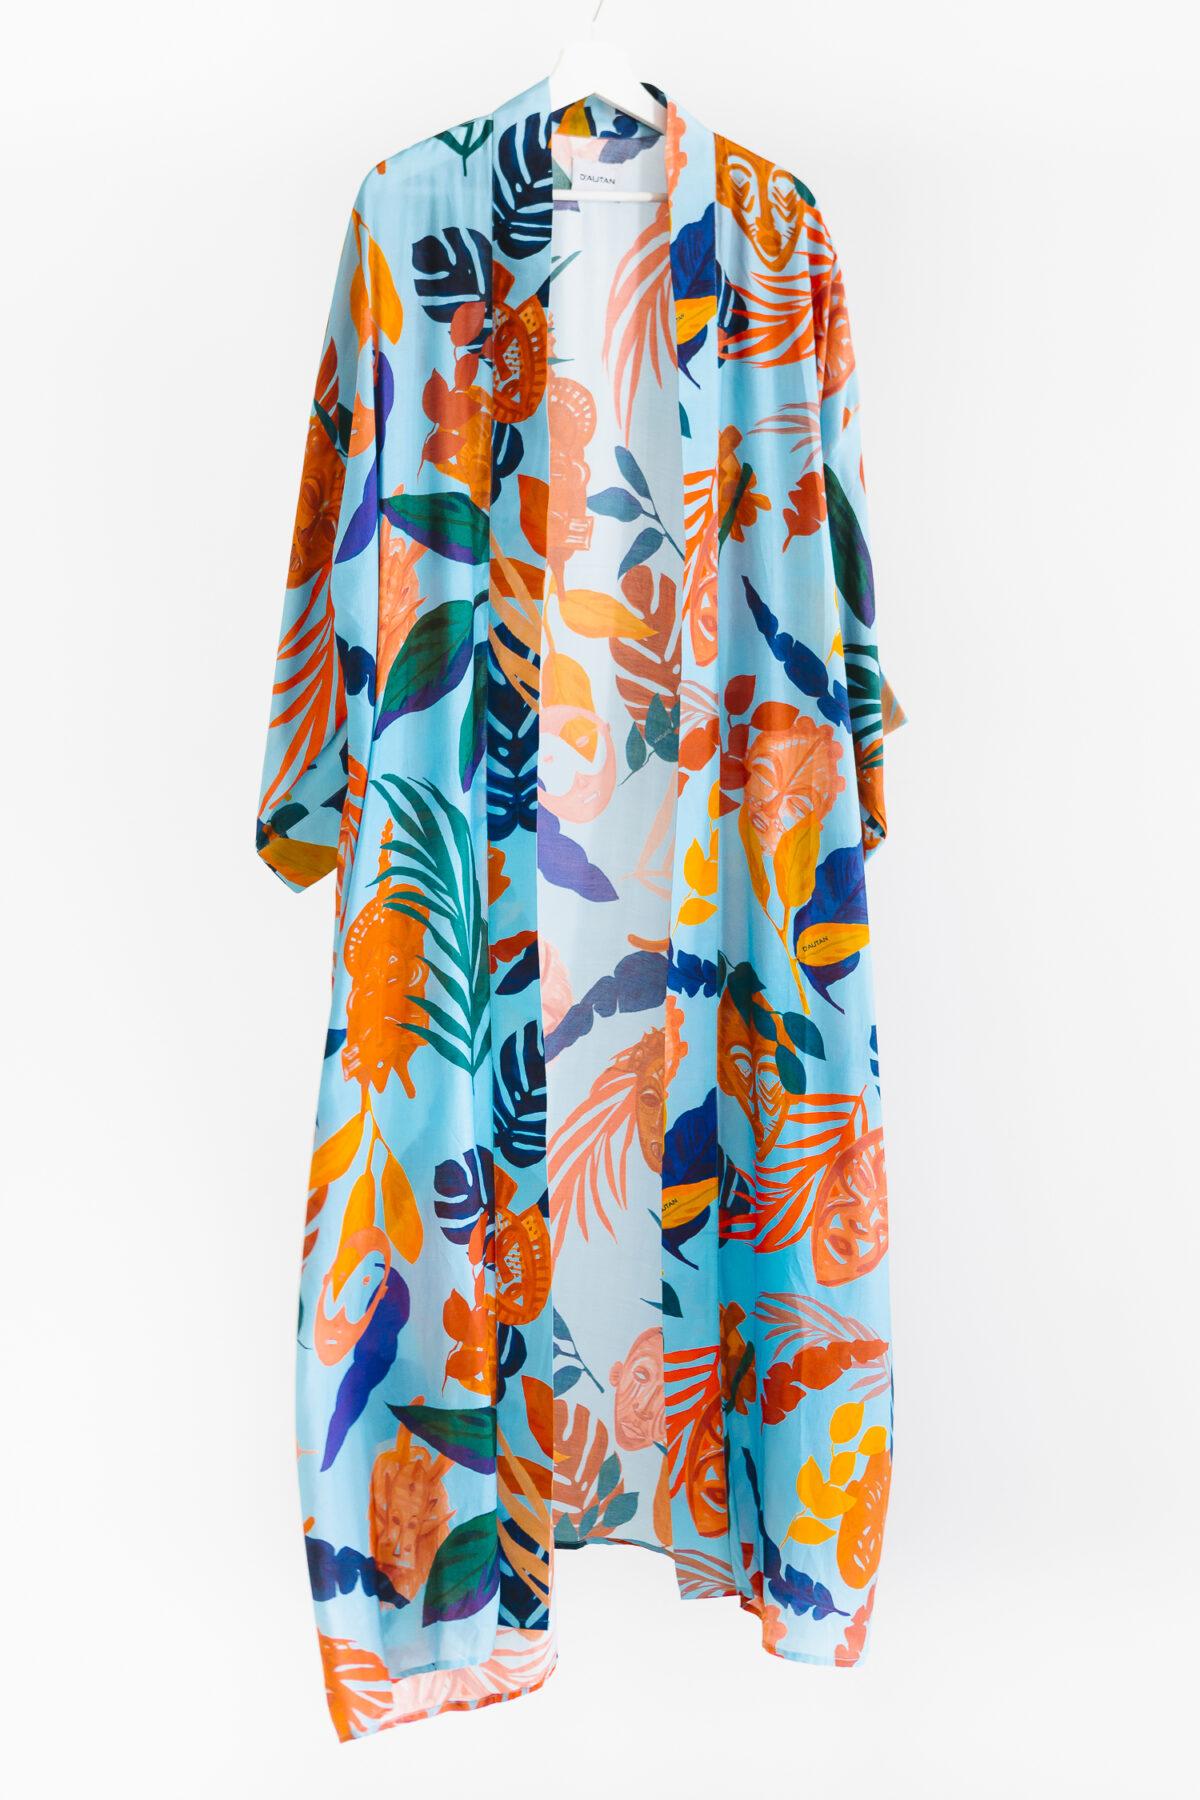 blue and orange kimono